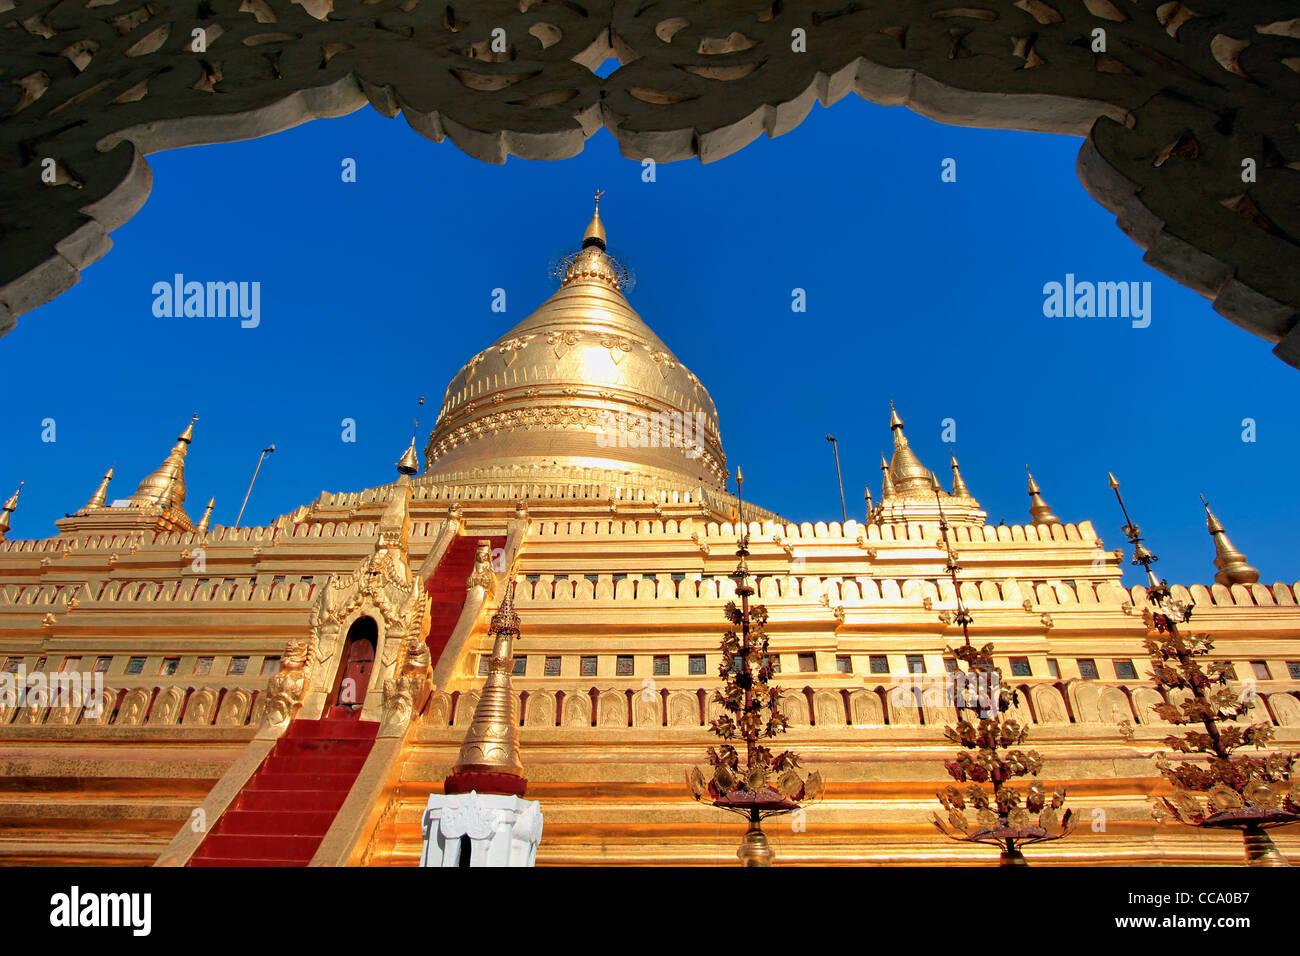 Shwezigon Paya (Pagoda)   Bagan (Pagan), Myanmar (Burma) Stock Photo